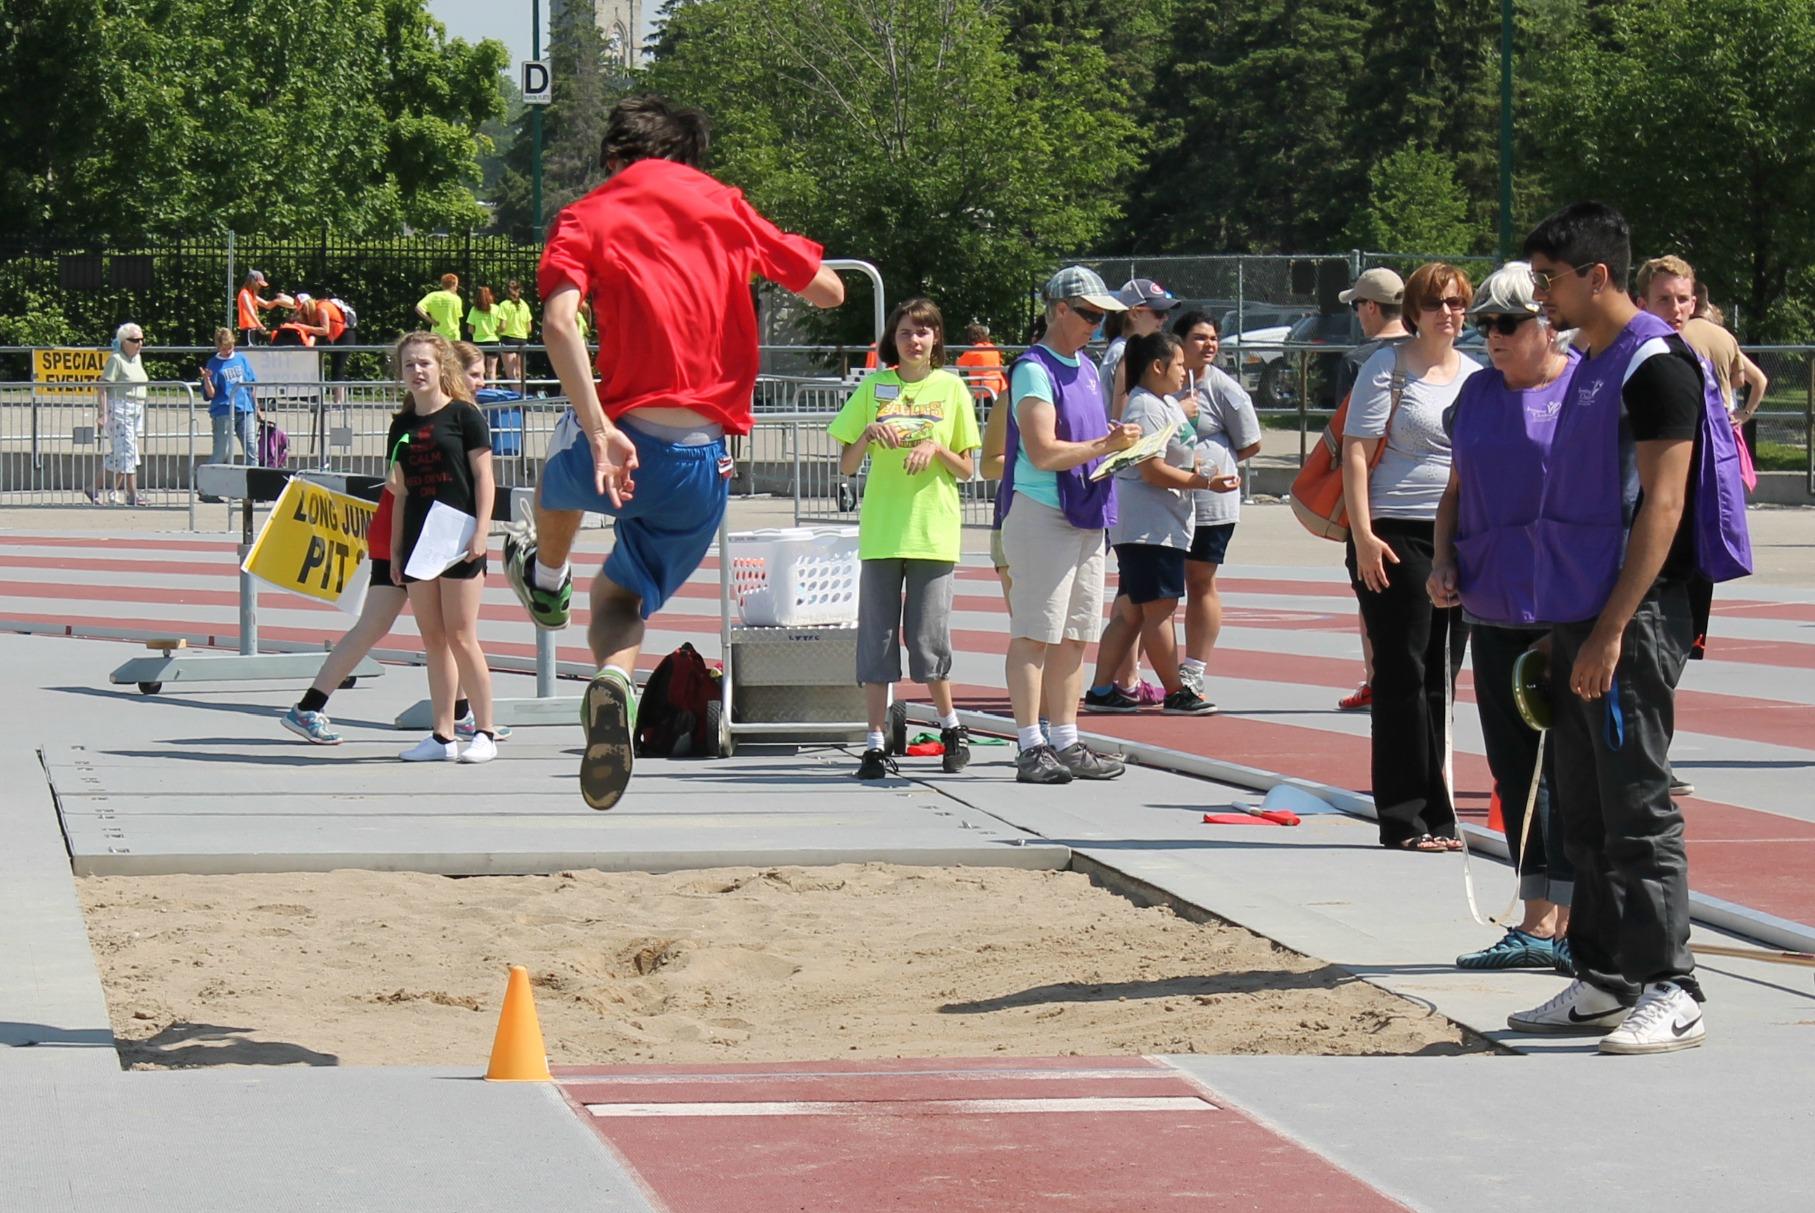 TVDSB Special Olympics 2015 - Long Jump